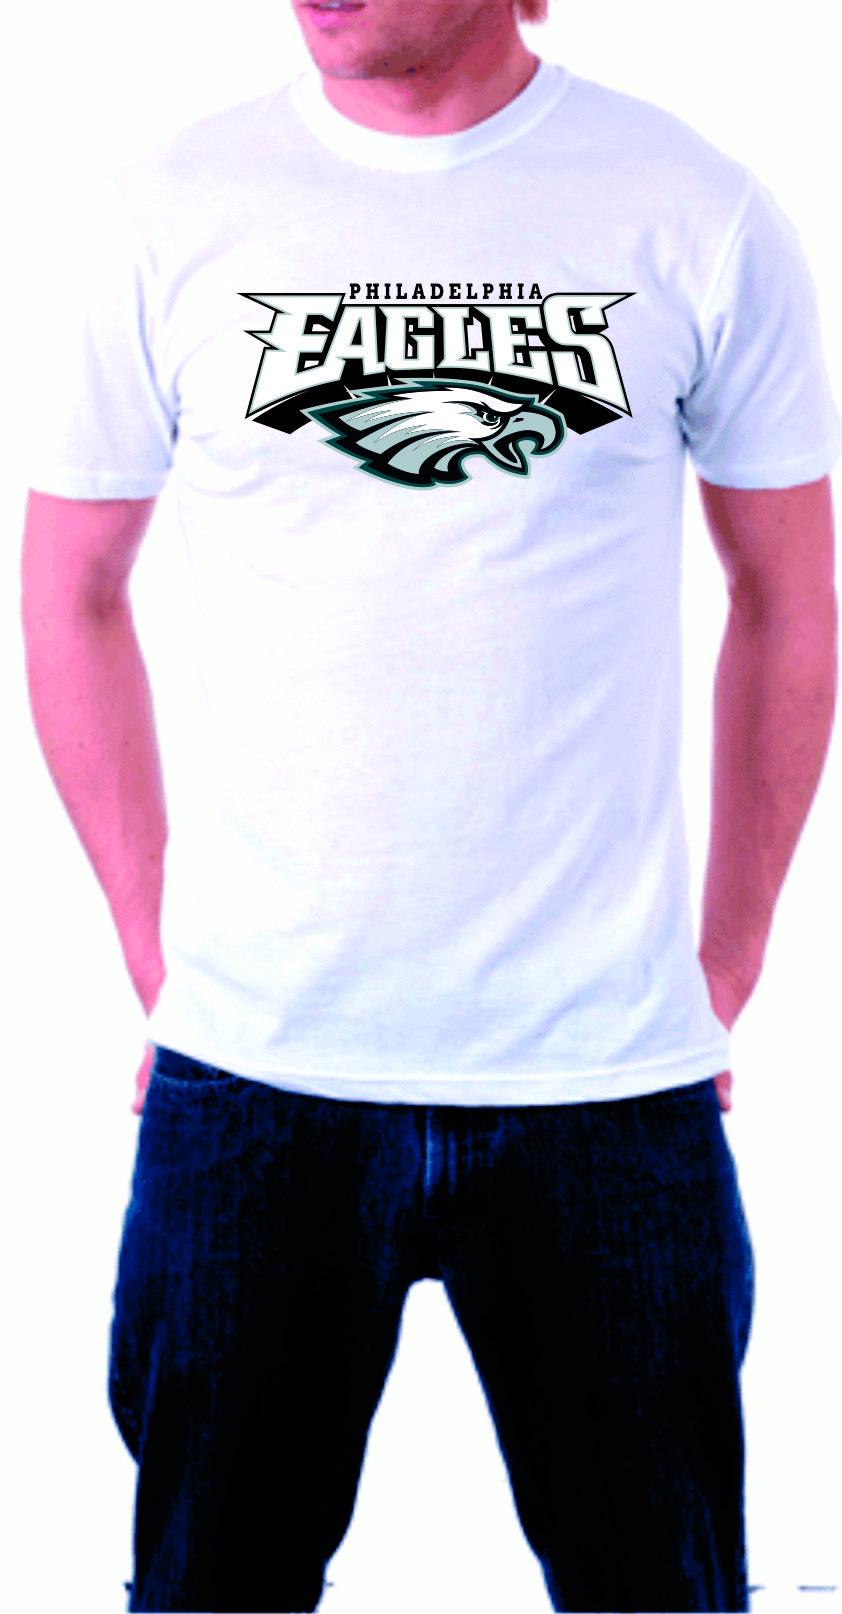 34a02ad66f Camiseta Philadelphia Eagles